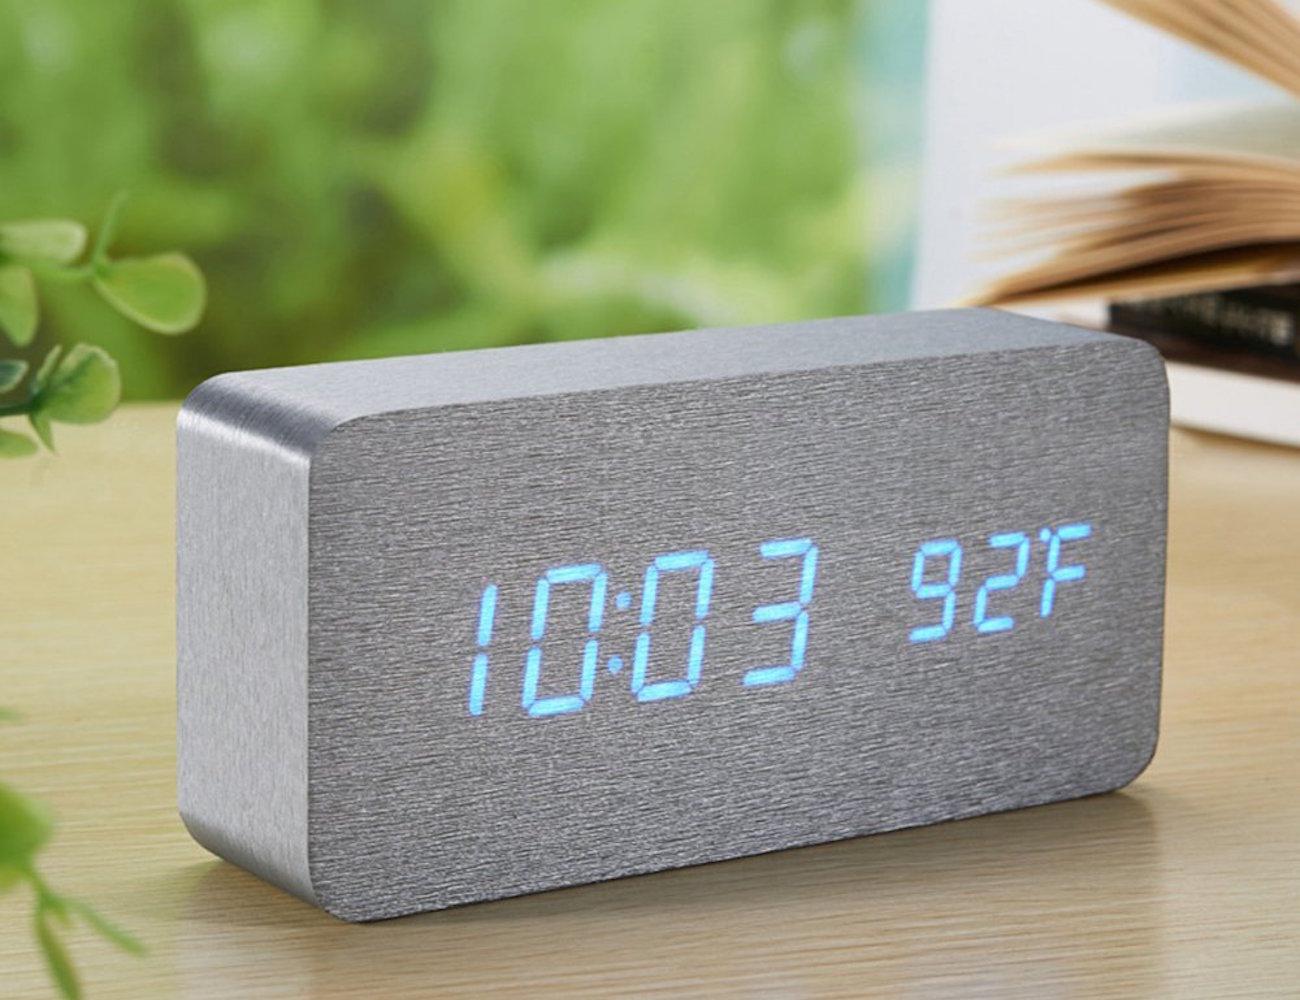 Sea Team – Wood-imitation Electronic Desk Clock